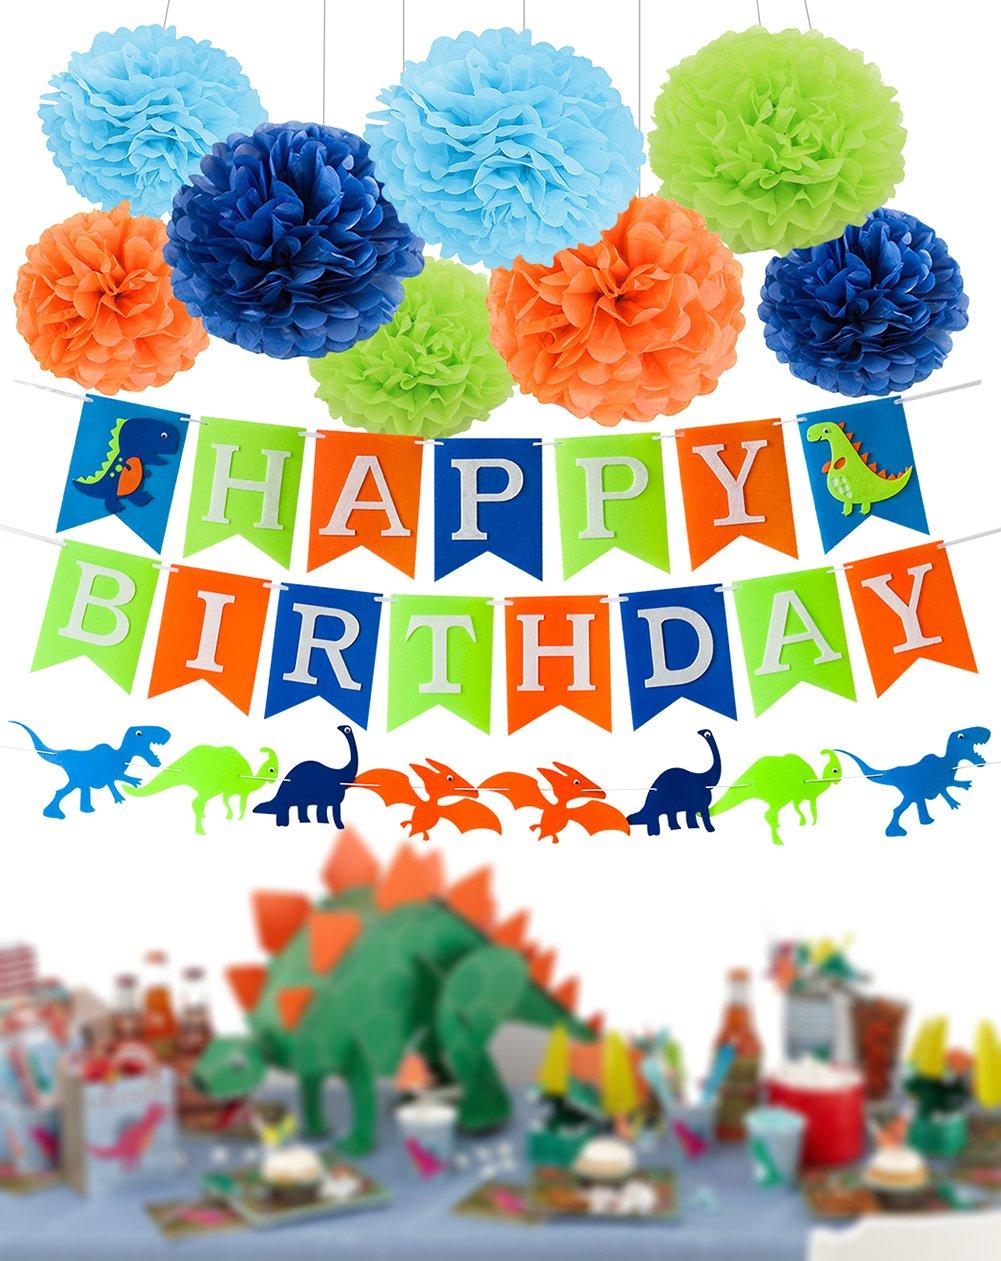 Dinosaur Party Supplies Dinosaur Happy Birthday Decorations Kit Dino Jungle Jurassic Garland Photo Props Tissue Paper Pom Poms for Kids Birthday